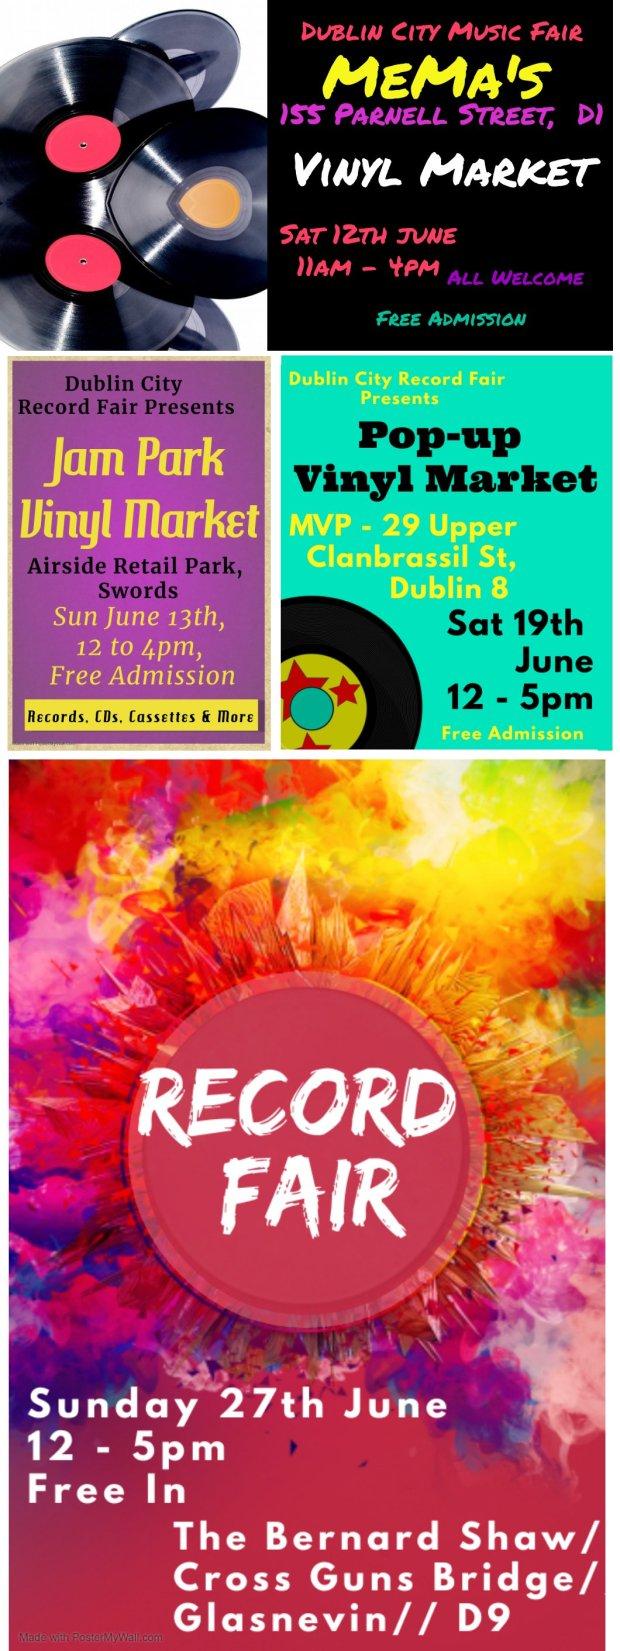 DUBLIN CITY RECORD FAIRS